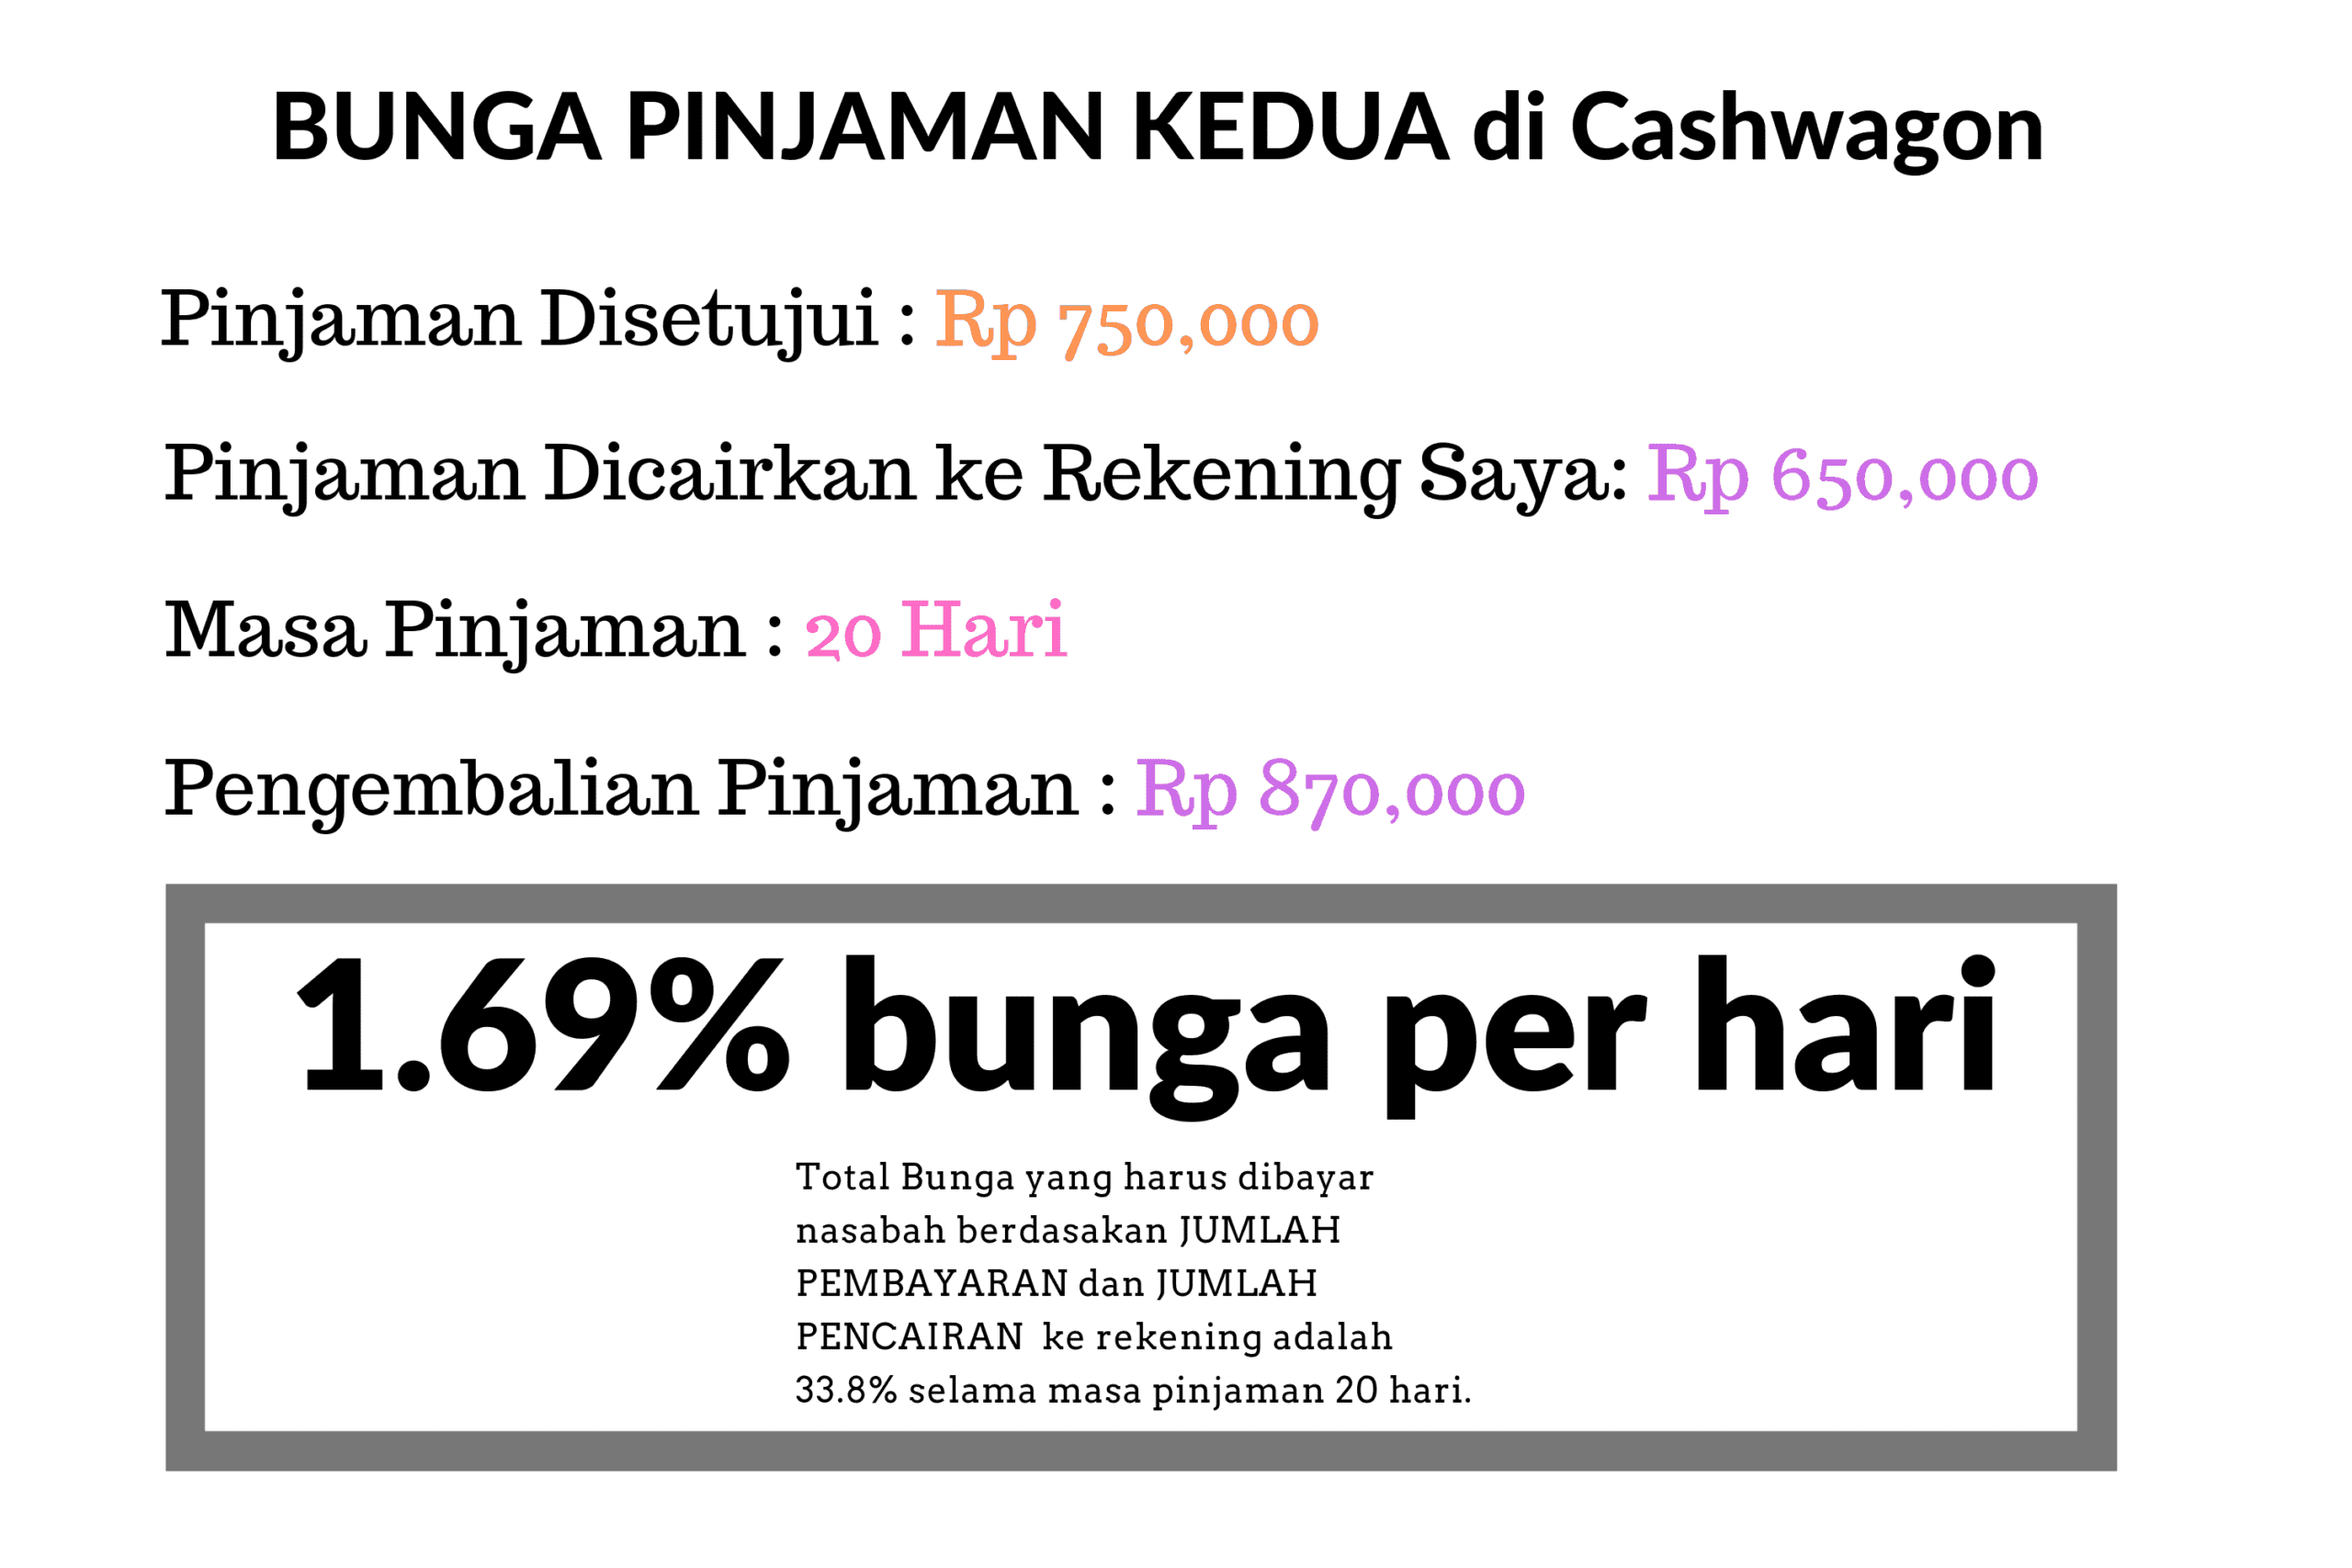 Fee Pinjaman Kedua di Cashwagon